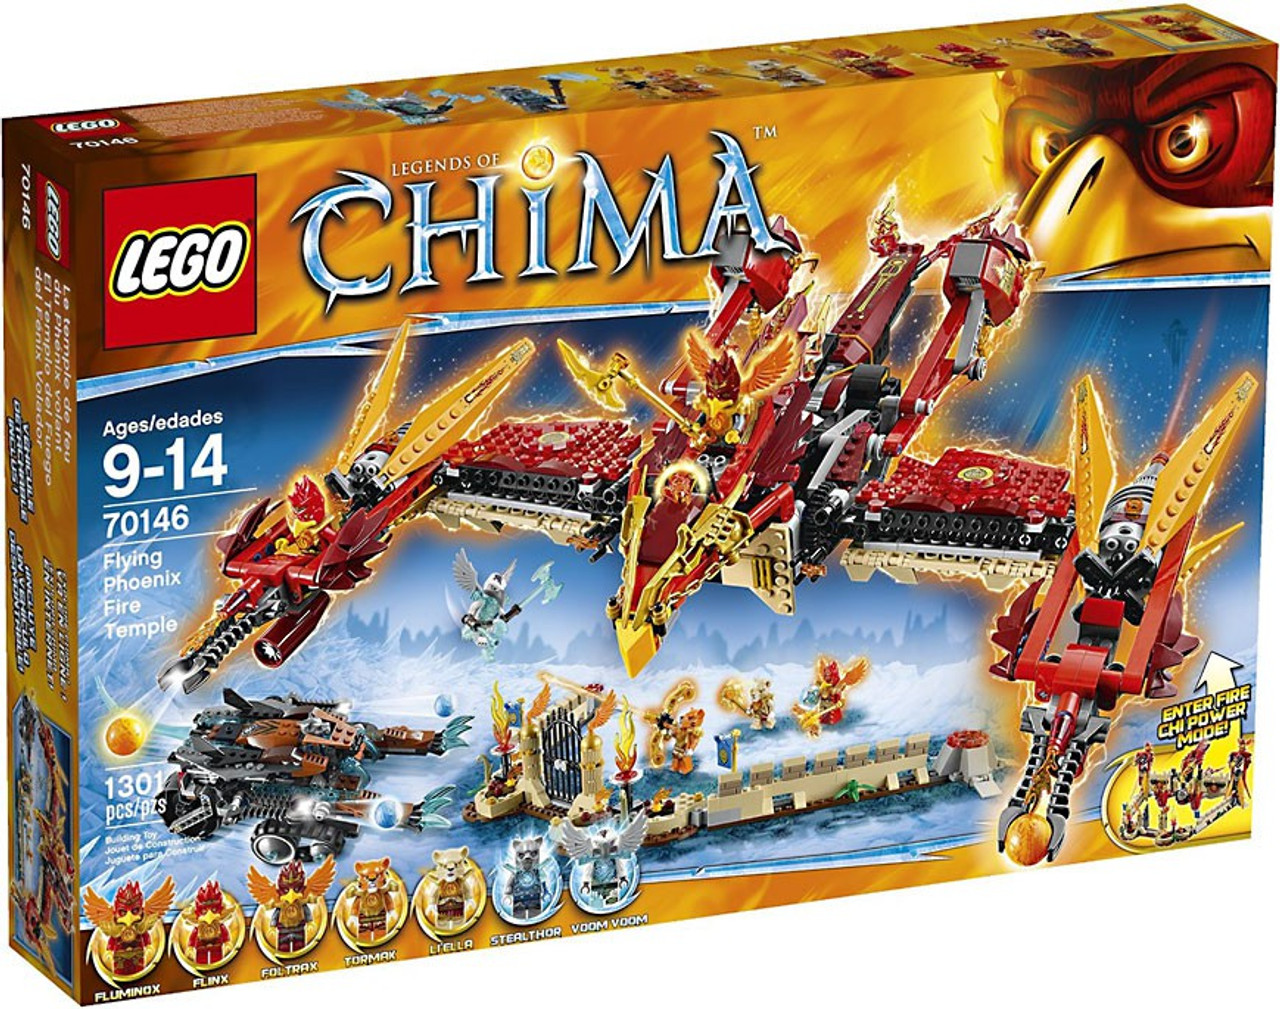 LEGO Legends of Chima Flying Phoenix Fire Temple Set #70146